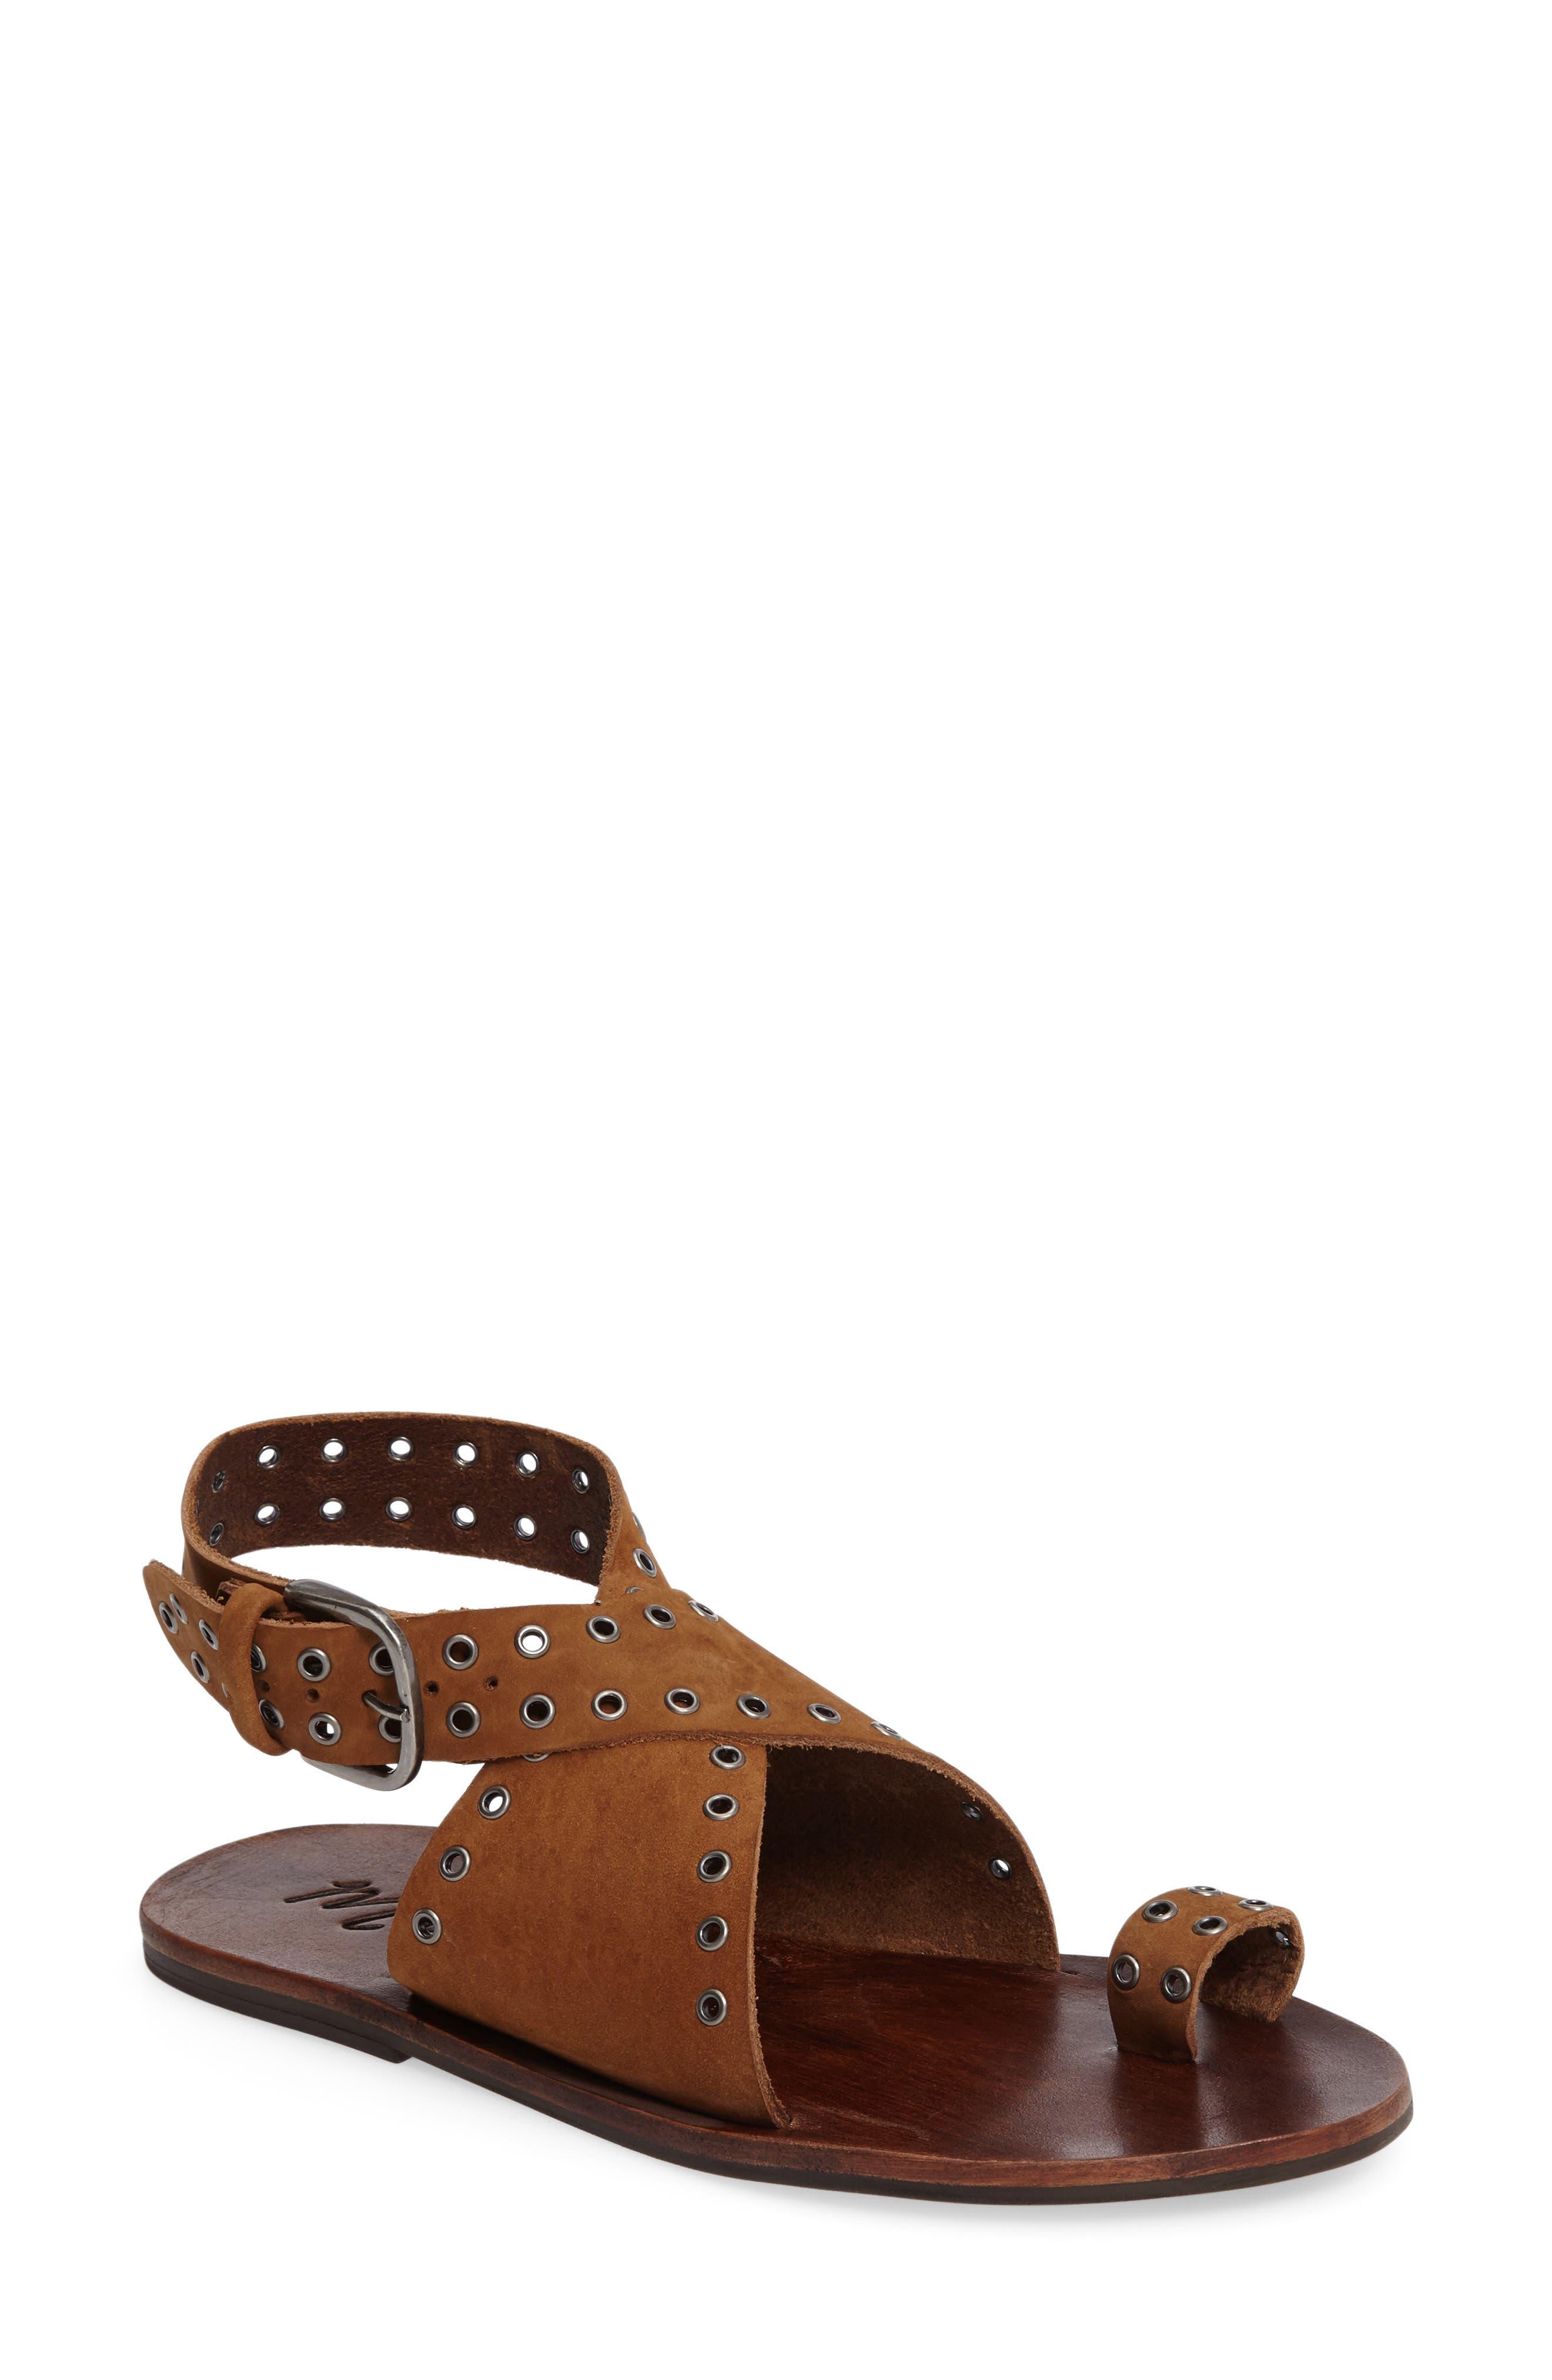 Starling Grommet Sandal,                         Main,                         color, Tan Suede